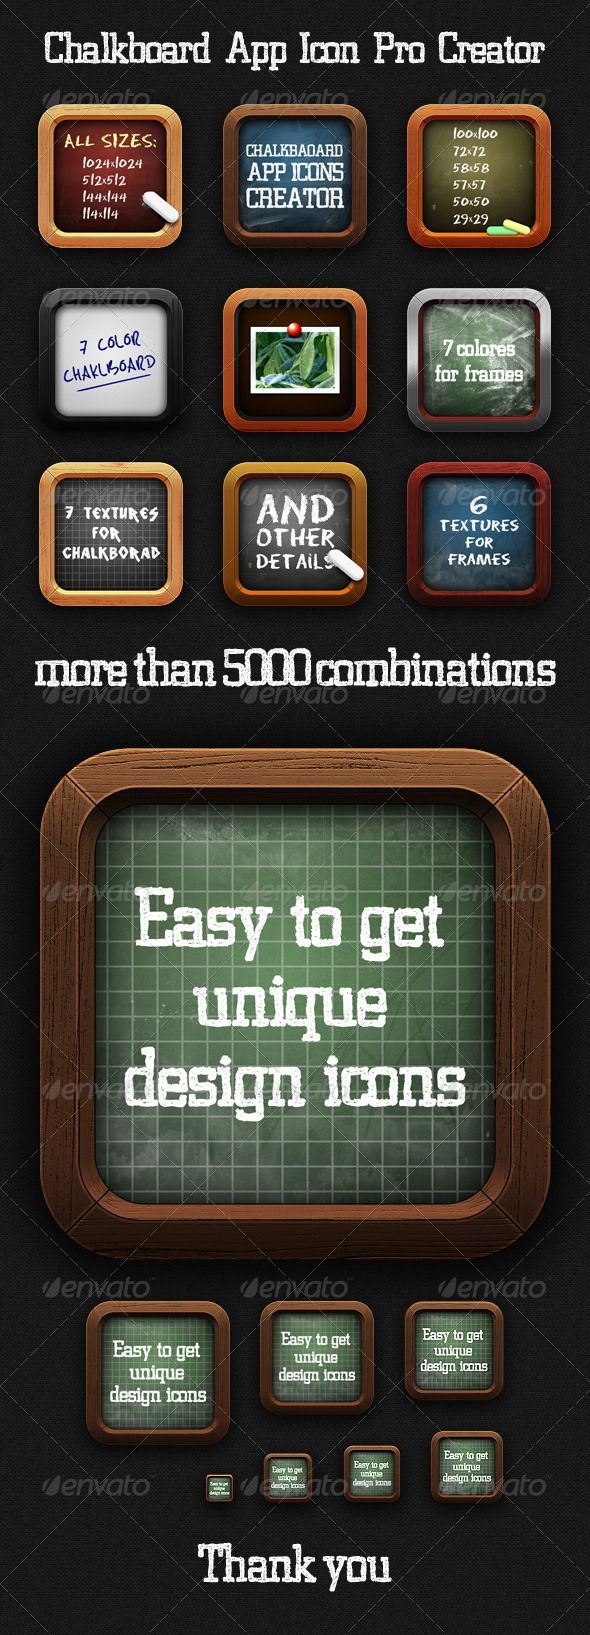 Shirt design maker app - Chalkboard App Icon Pro Creator